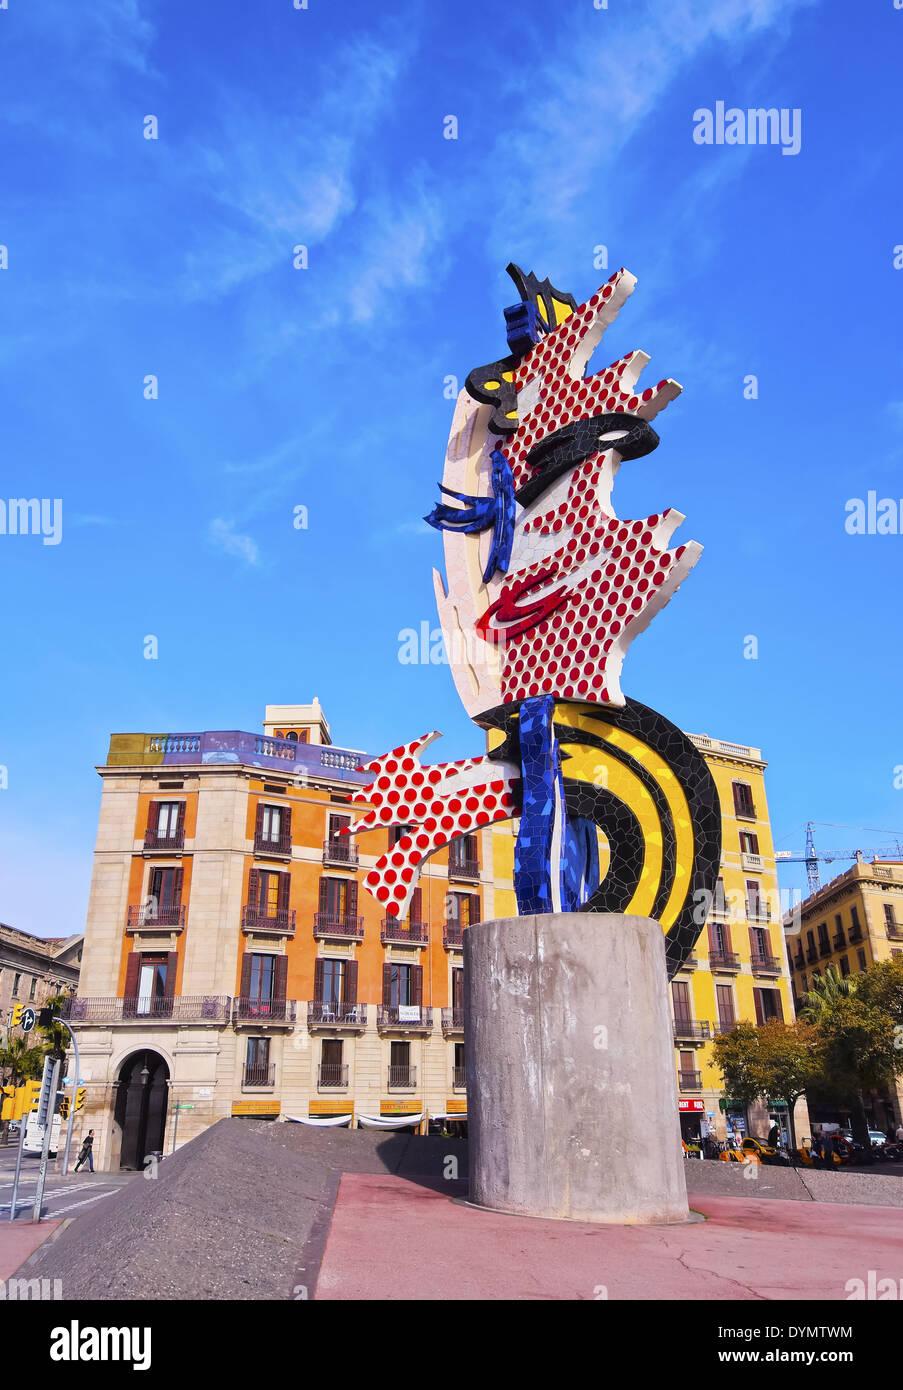 d0cf5c7ac24 El Cap de Barcelona - a surrealist sculpture created by American Pop artist  Roy Lichtenstein for the 1992 Summer Olympics in